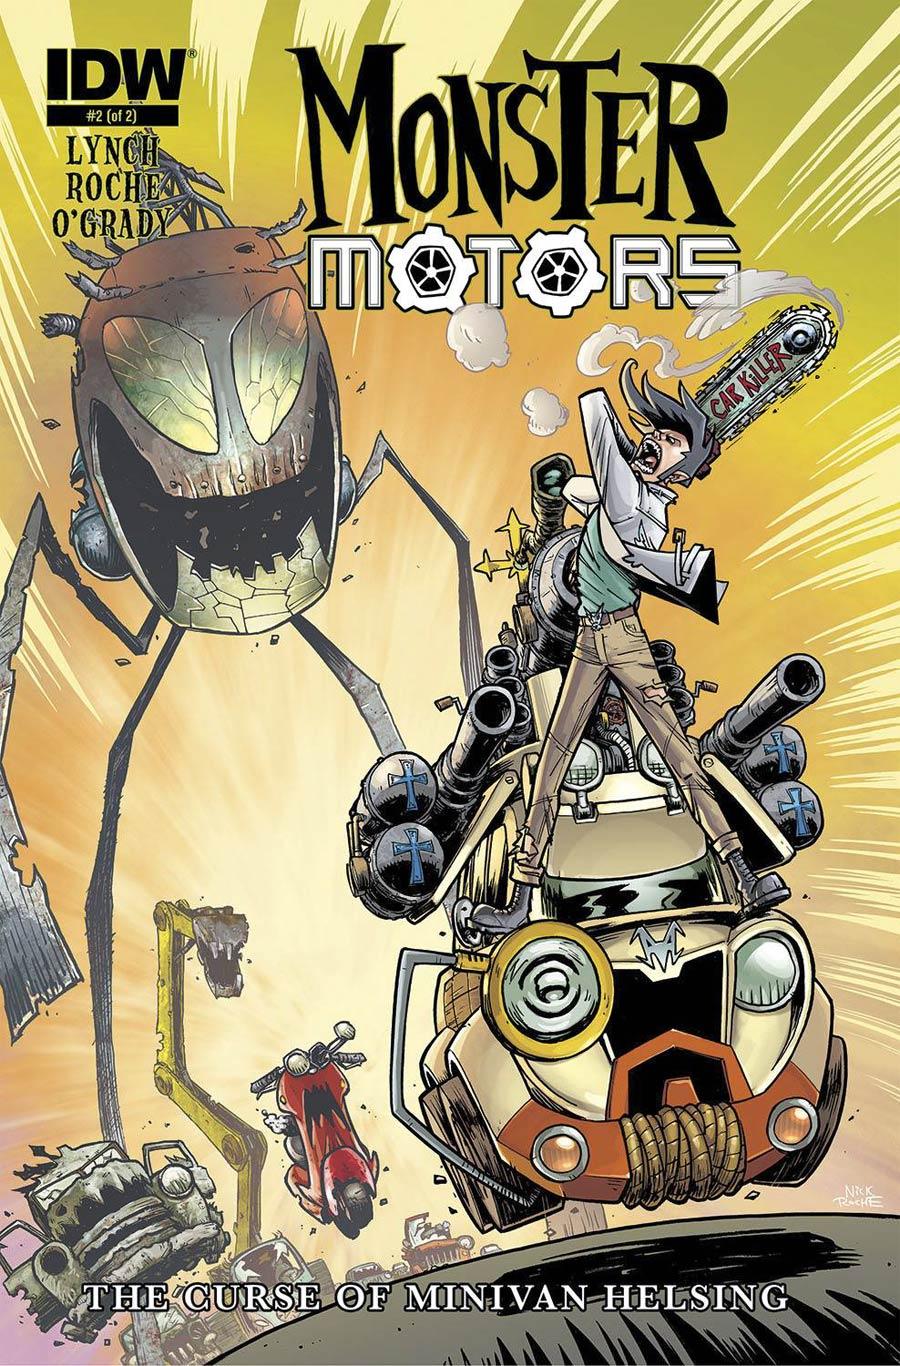 Monster Motors Curse Of Minivan Helsing #2